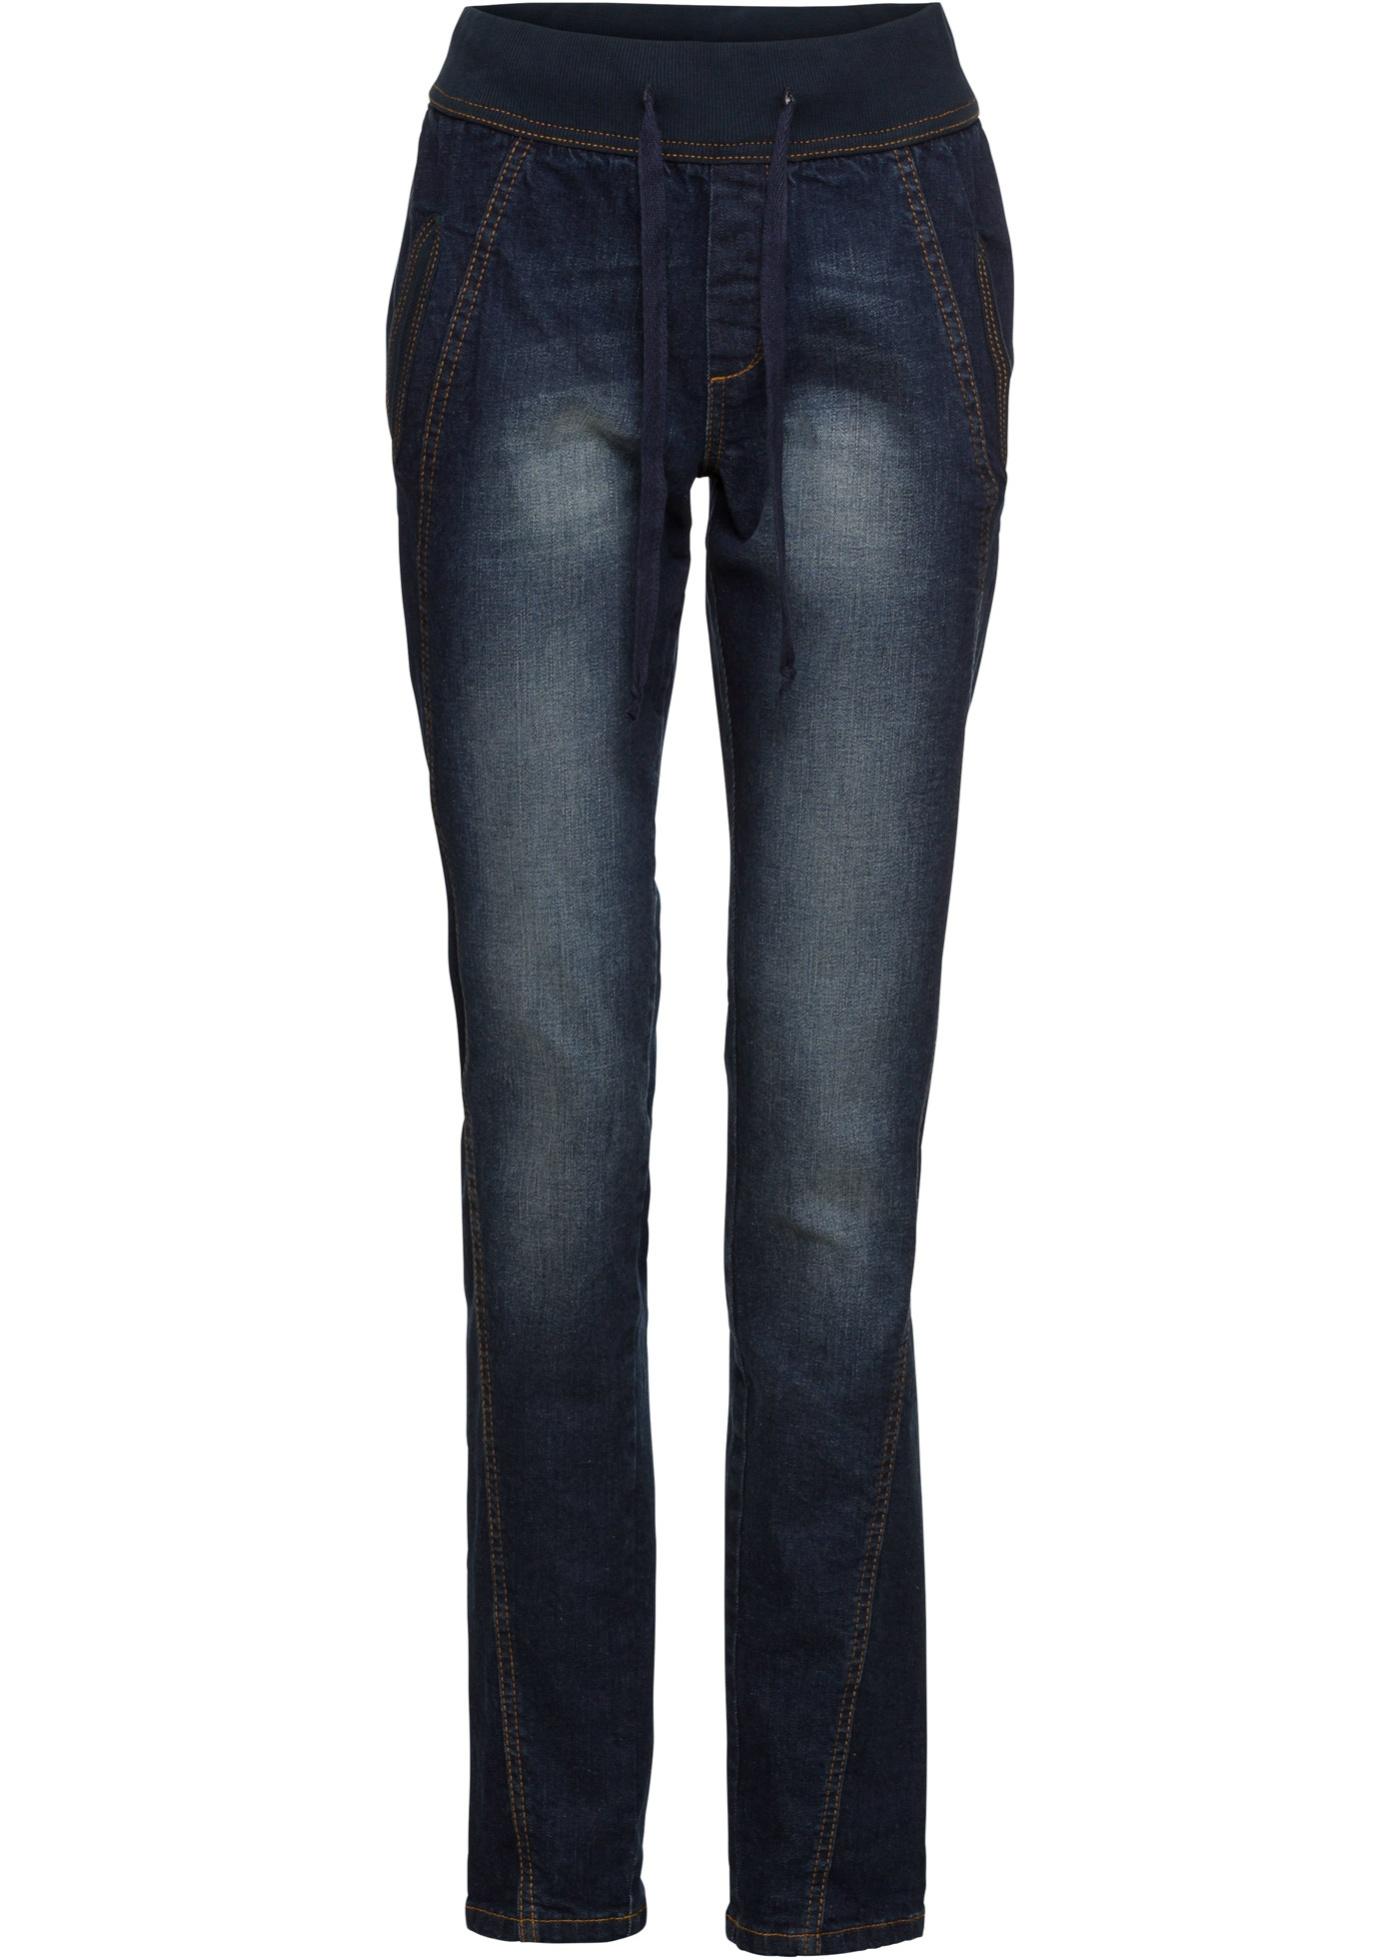 Bonprix SE - Jeans 349.00